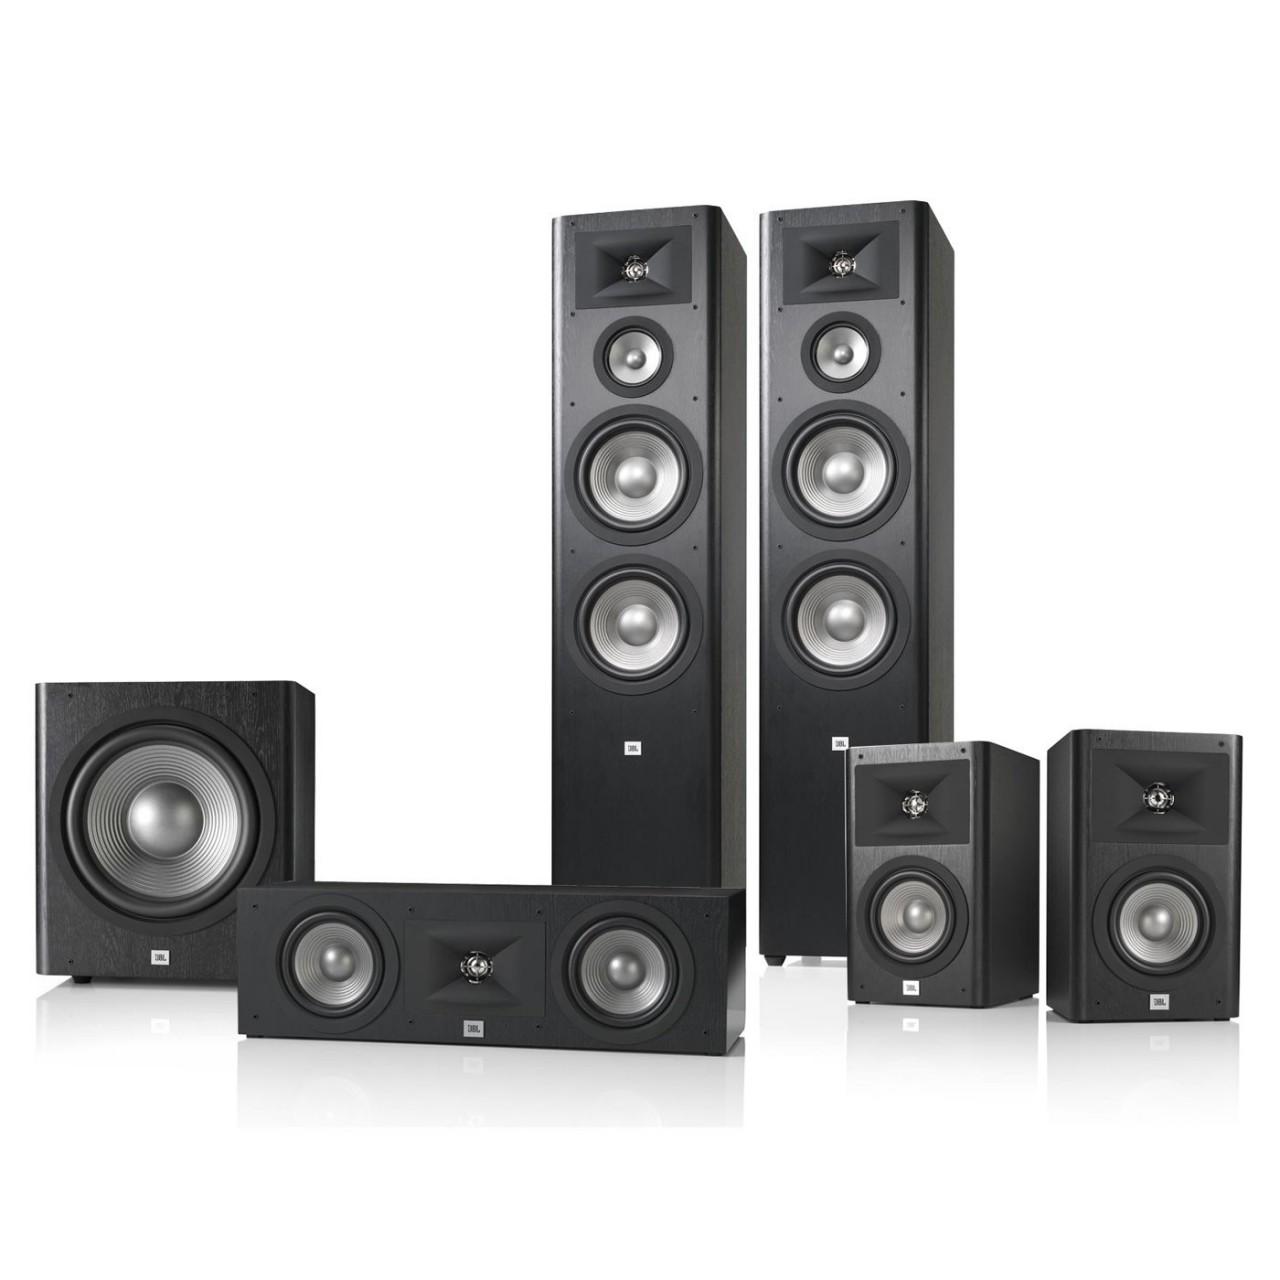 Jbl Speakers Home Theater Price